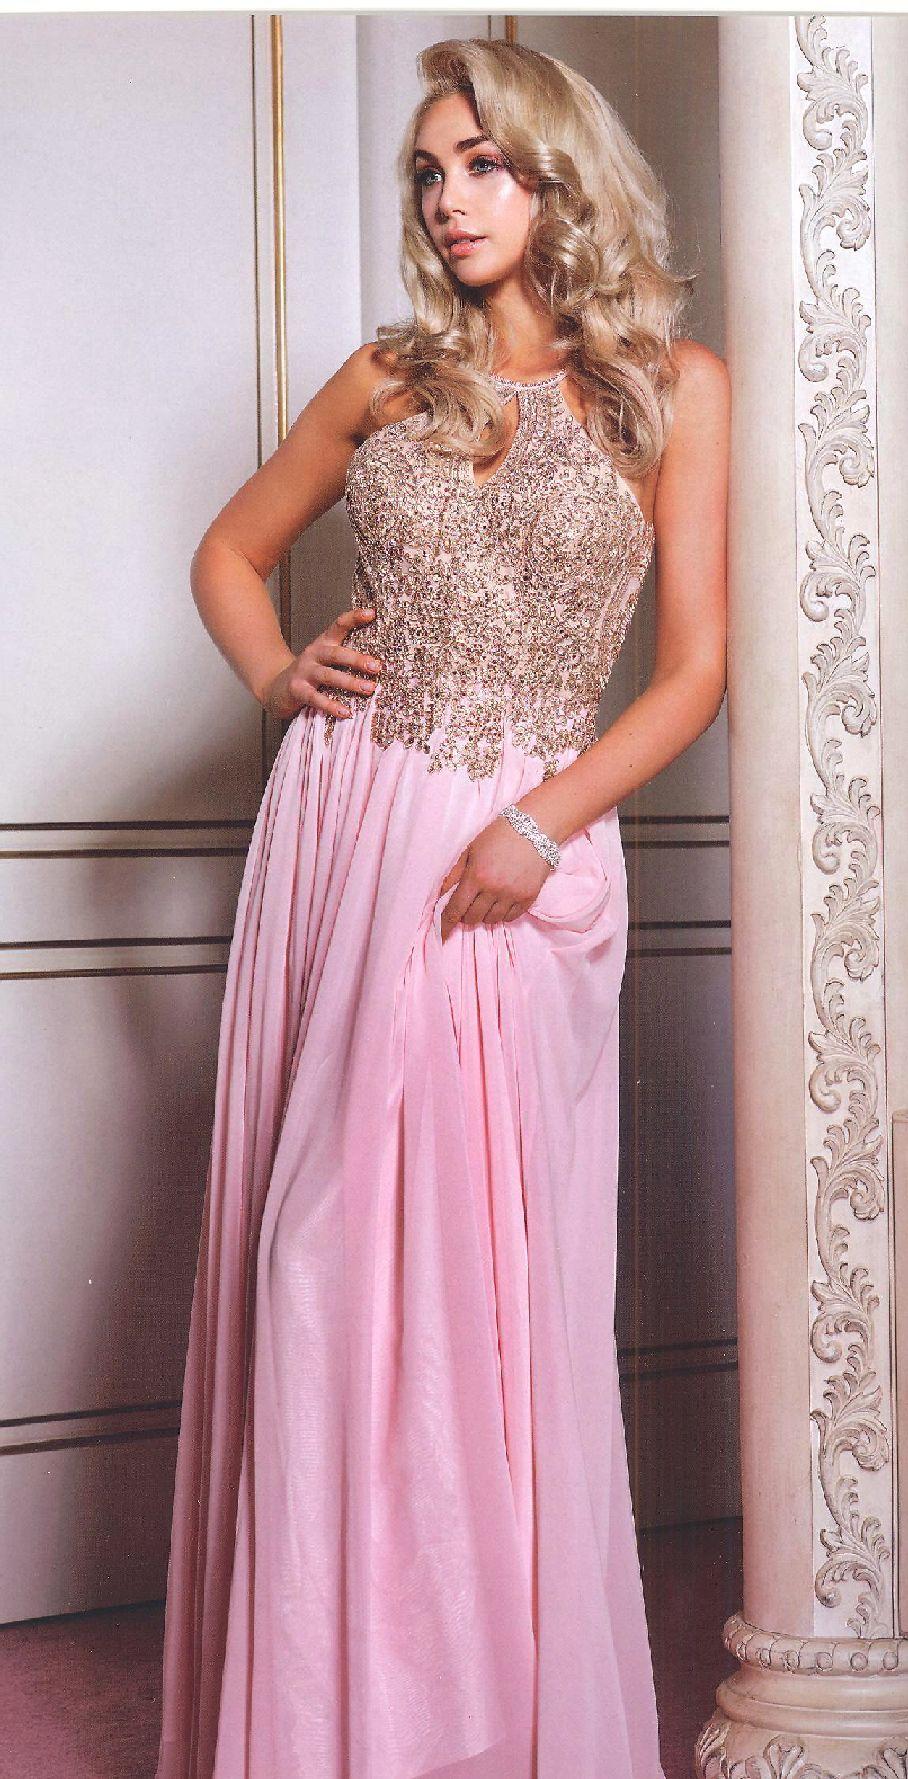 Prom dresses evening dresses by anabelucbrueanabucbruestunning